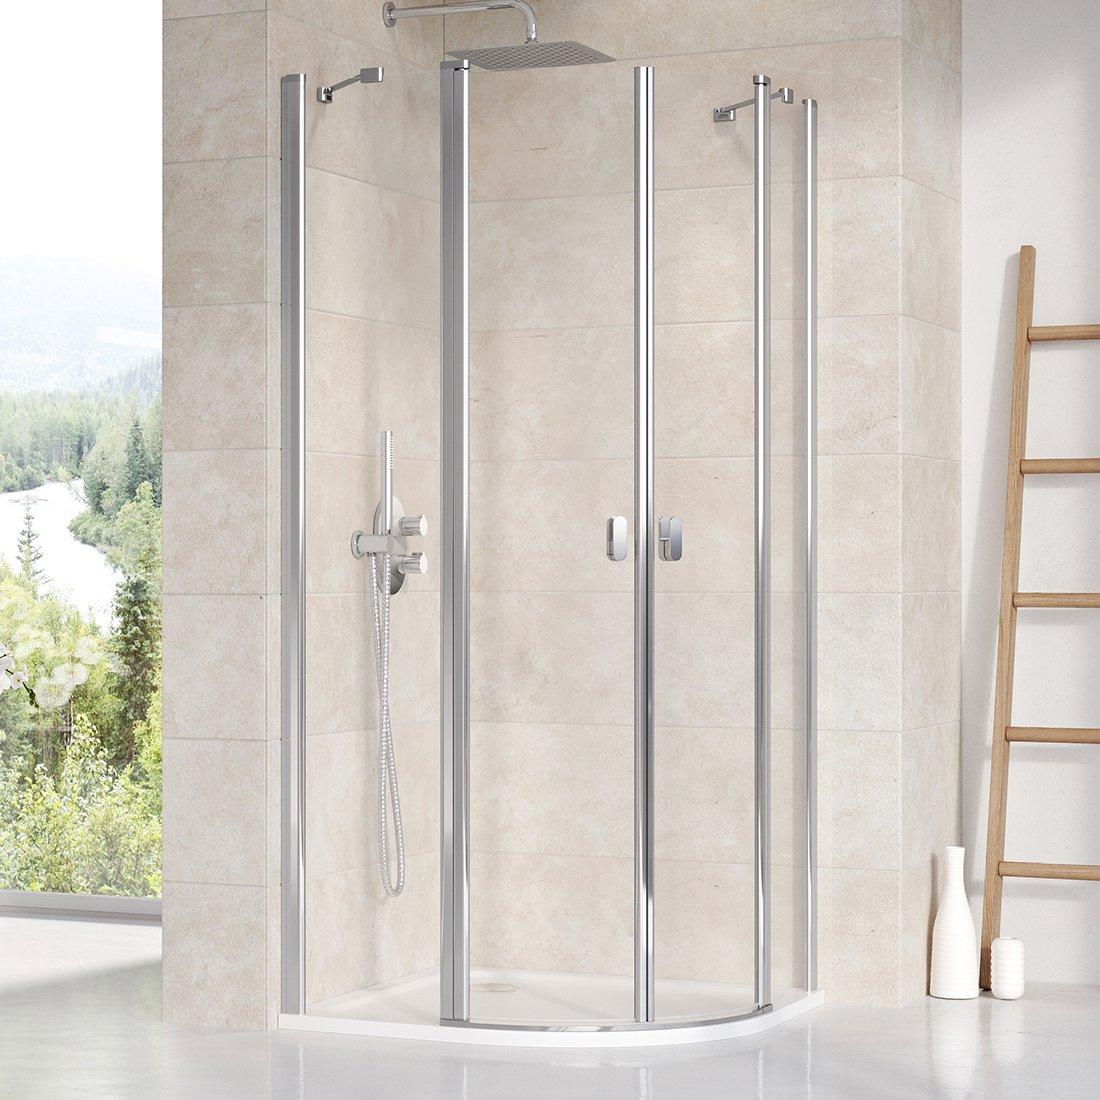 Pusapvalė dušo kabina Ravak Chrome, CSKK4-90 blizgi+Transparent